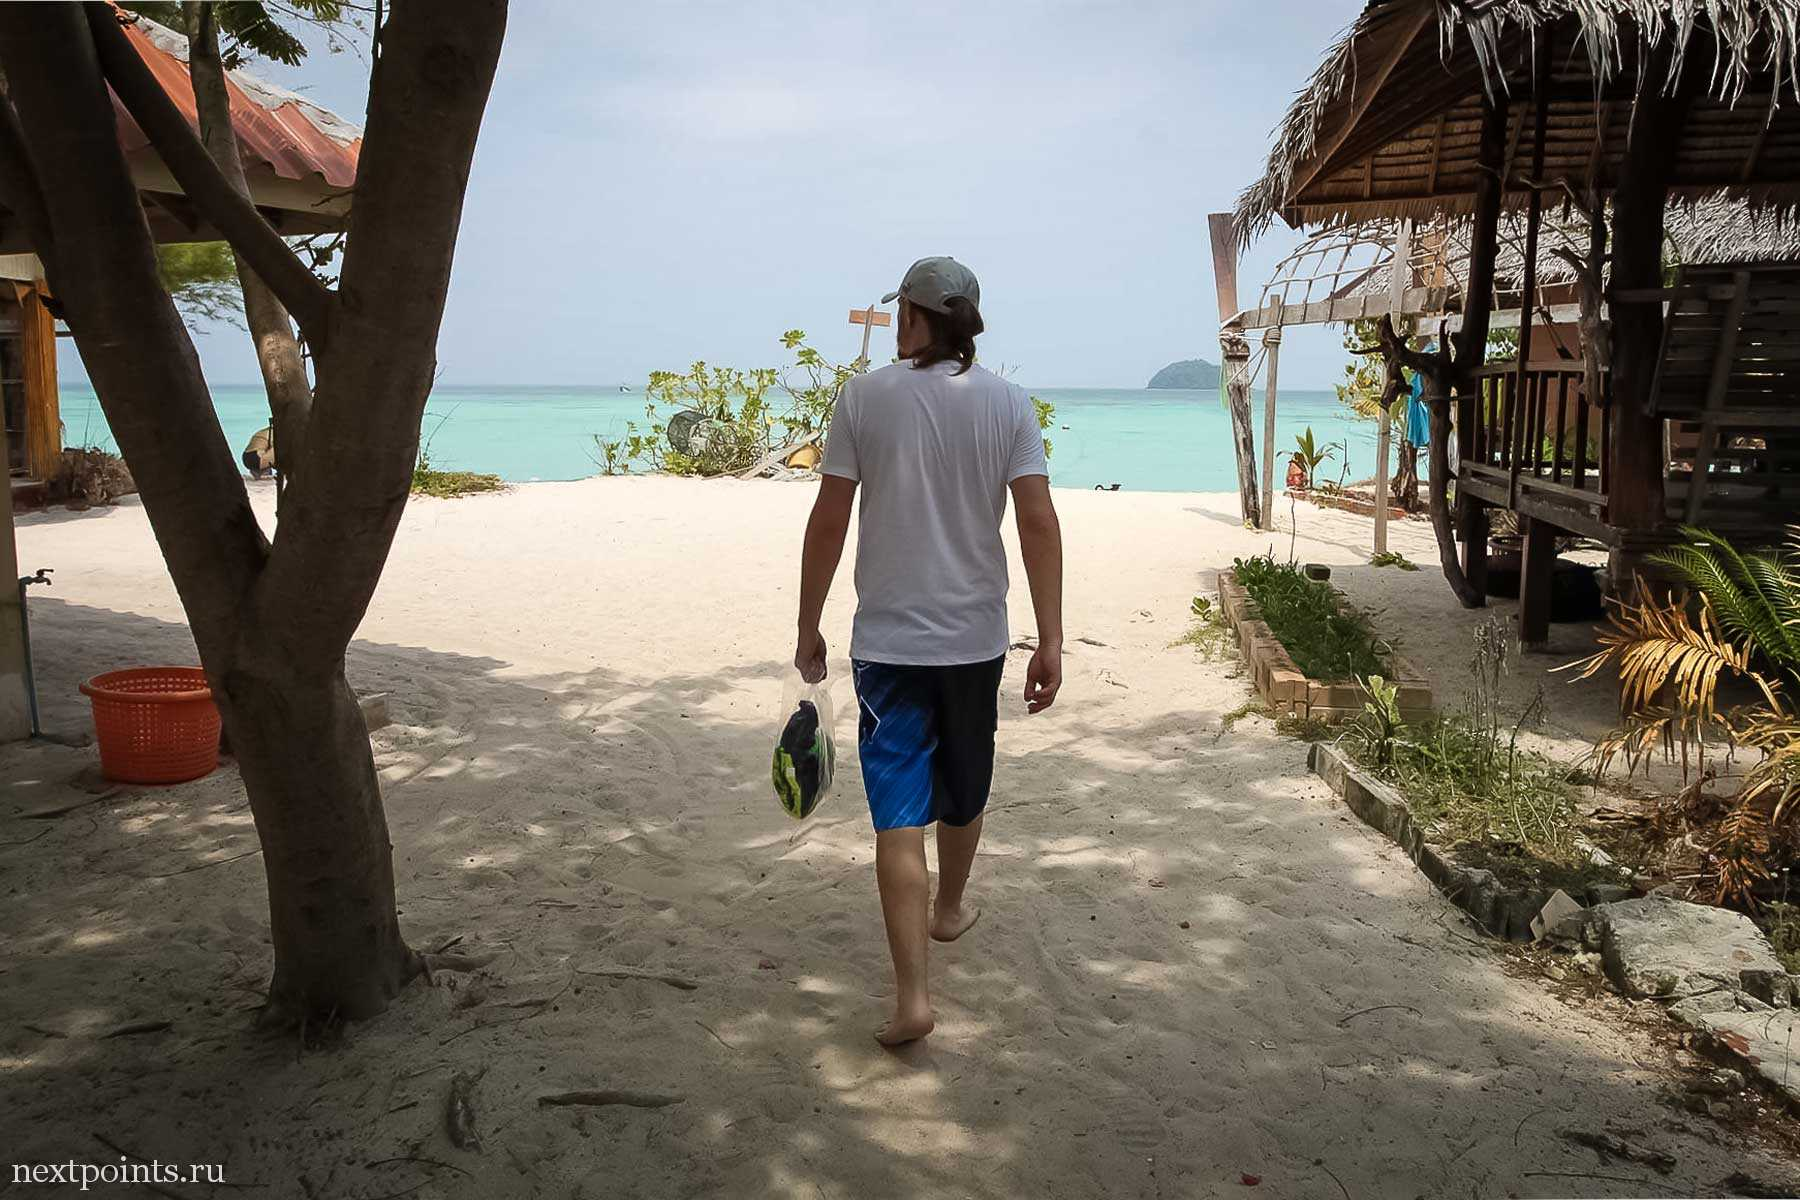 Выходим к пляжу Санрайз (Sunrise beach) на Ко Липе